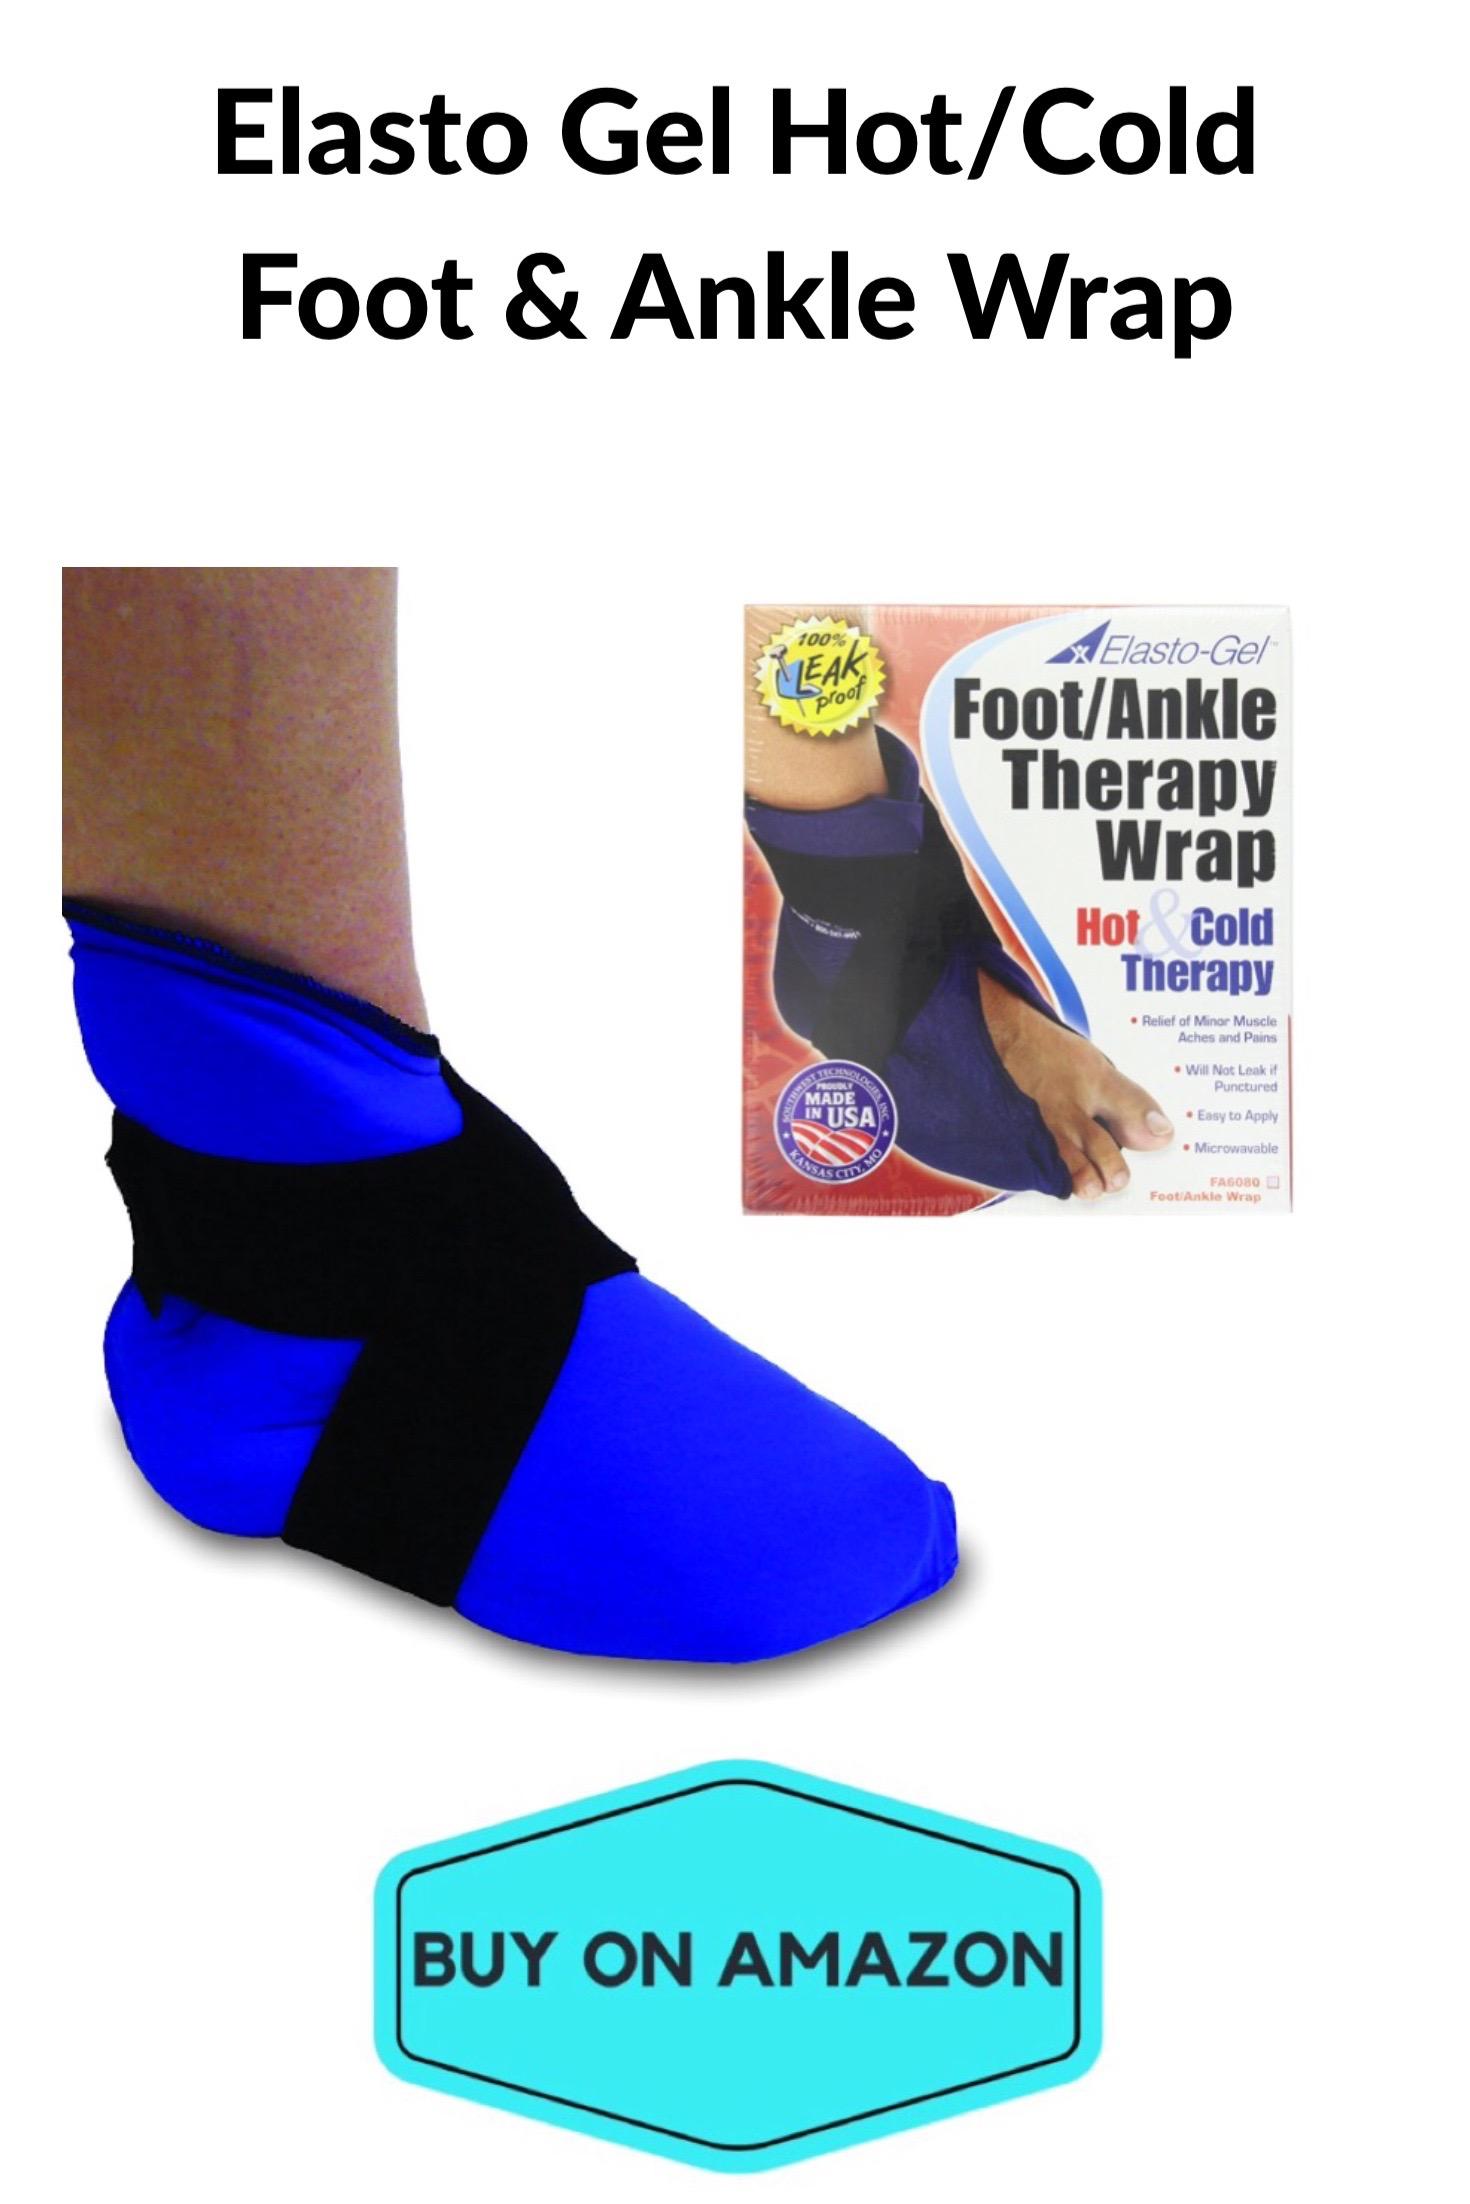 Elasto Gel Hot/Cold Foot & Ankle Wrap